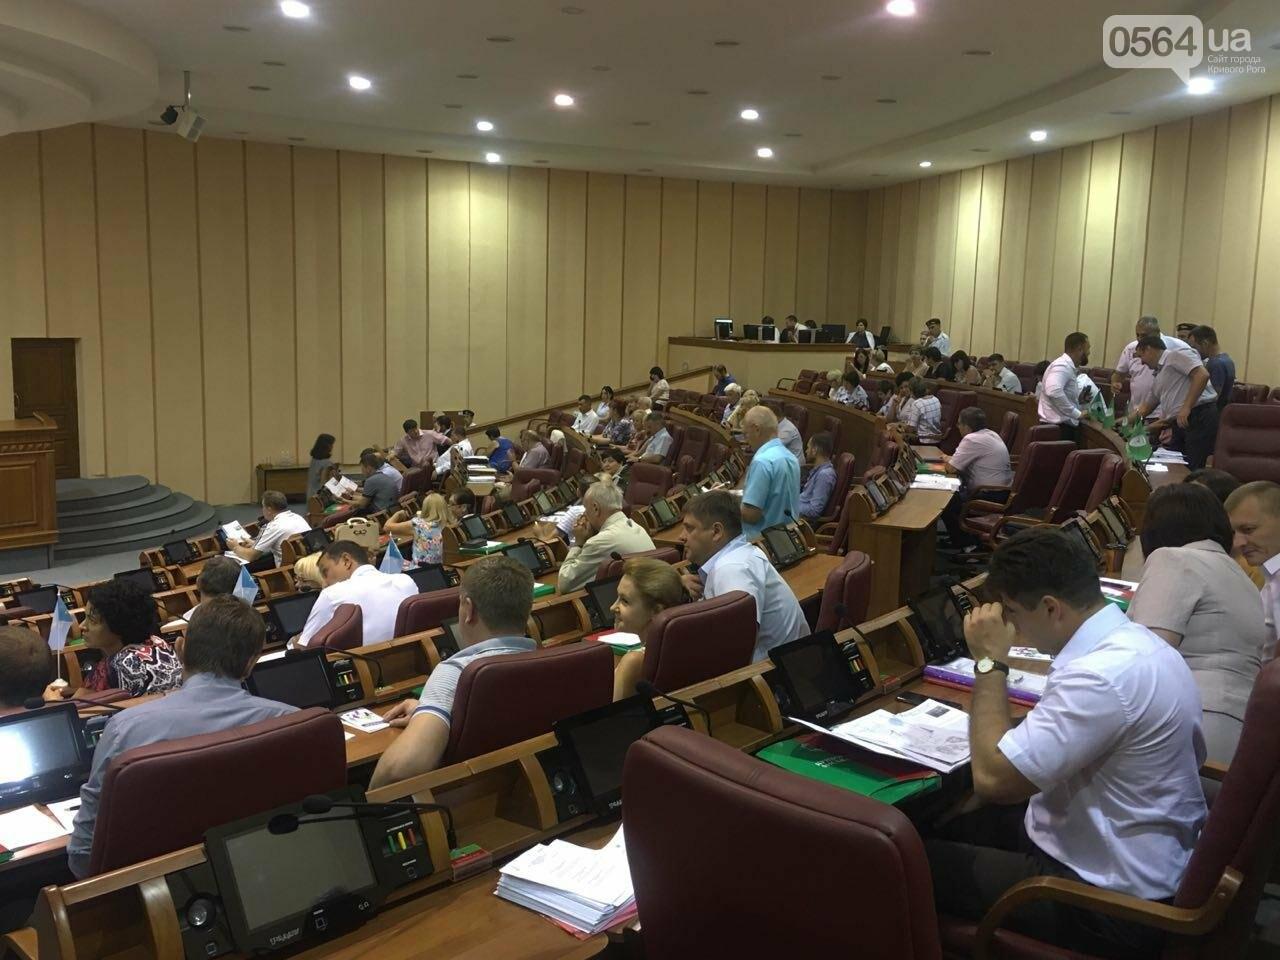 Криворожский горсовет не поддержал петицию о запрете Марша равенства, - ФОТО, фото-9